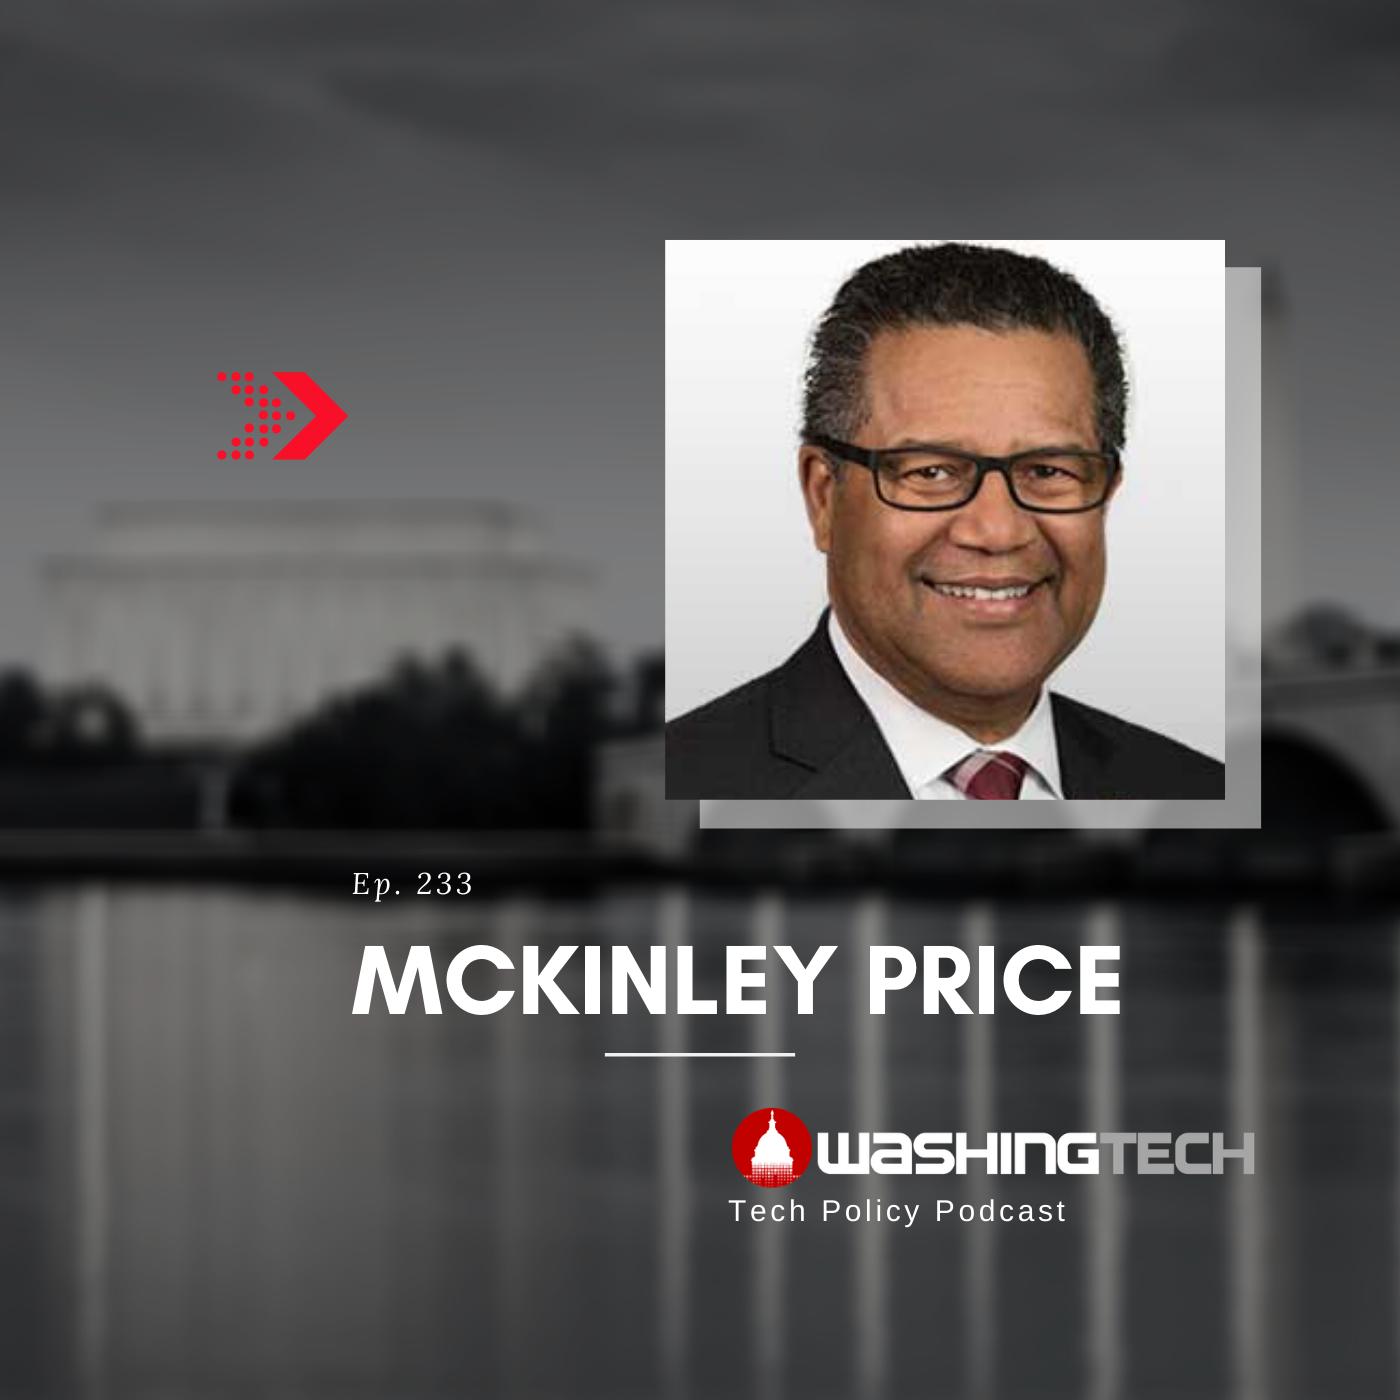 McKinley Price